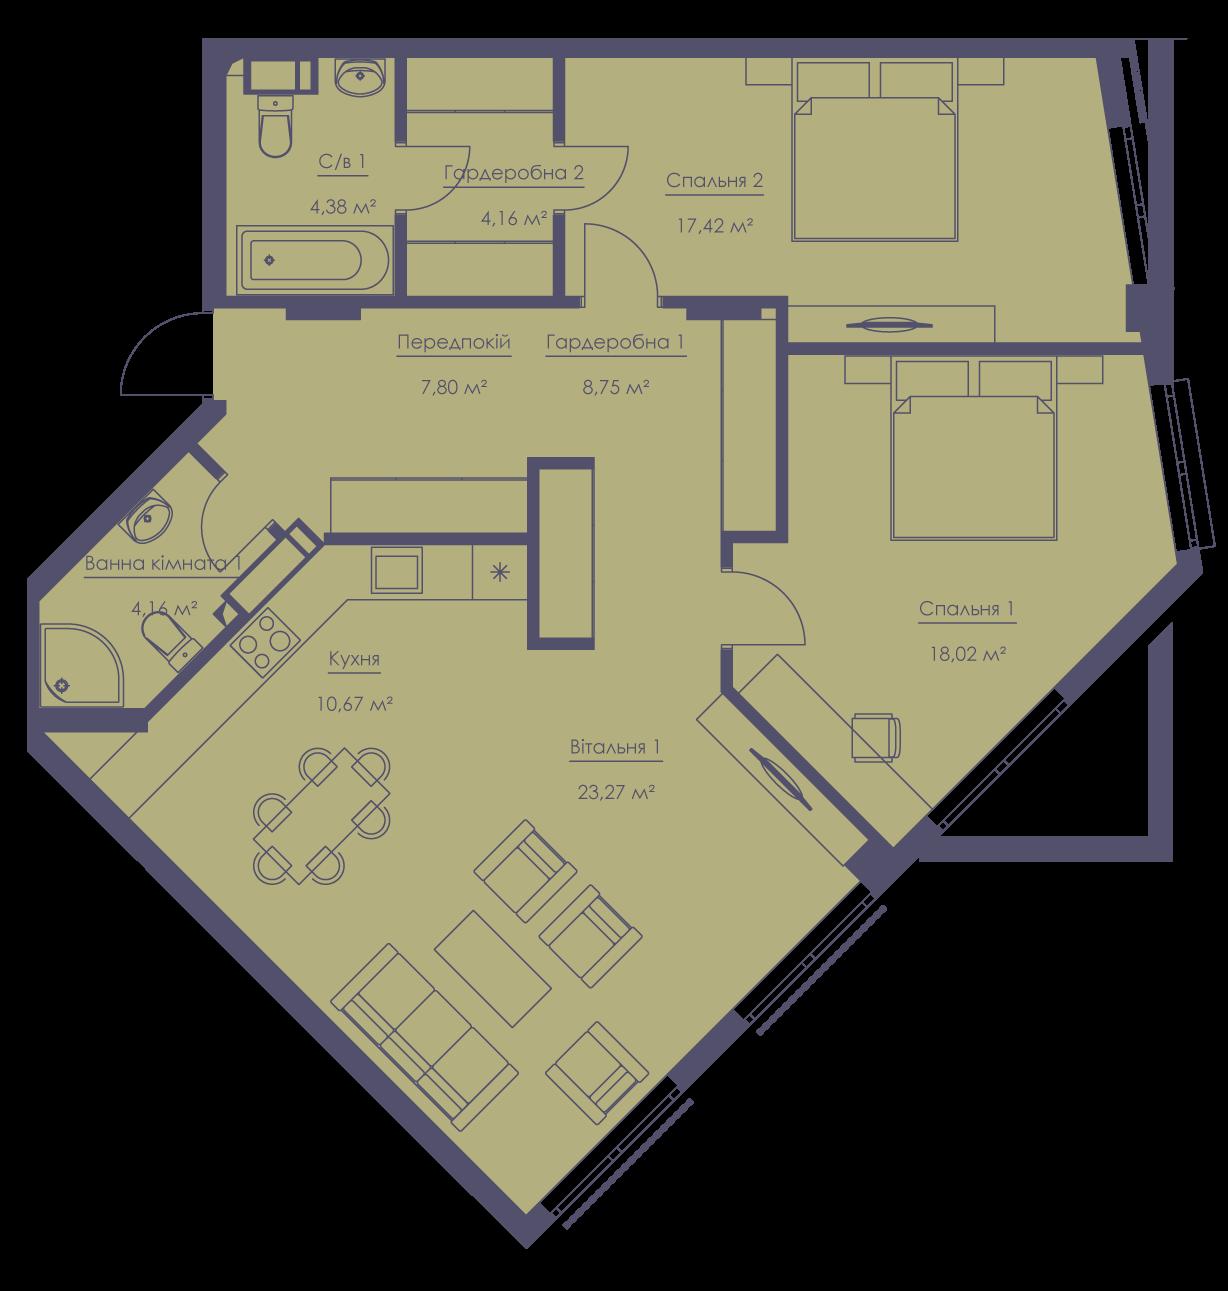 Apartment layout KV_101_3a_1_1_12-1